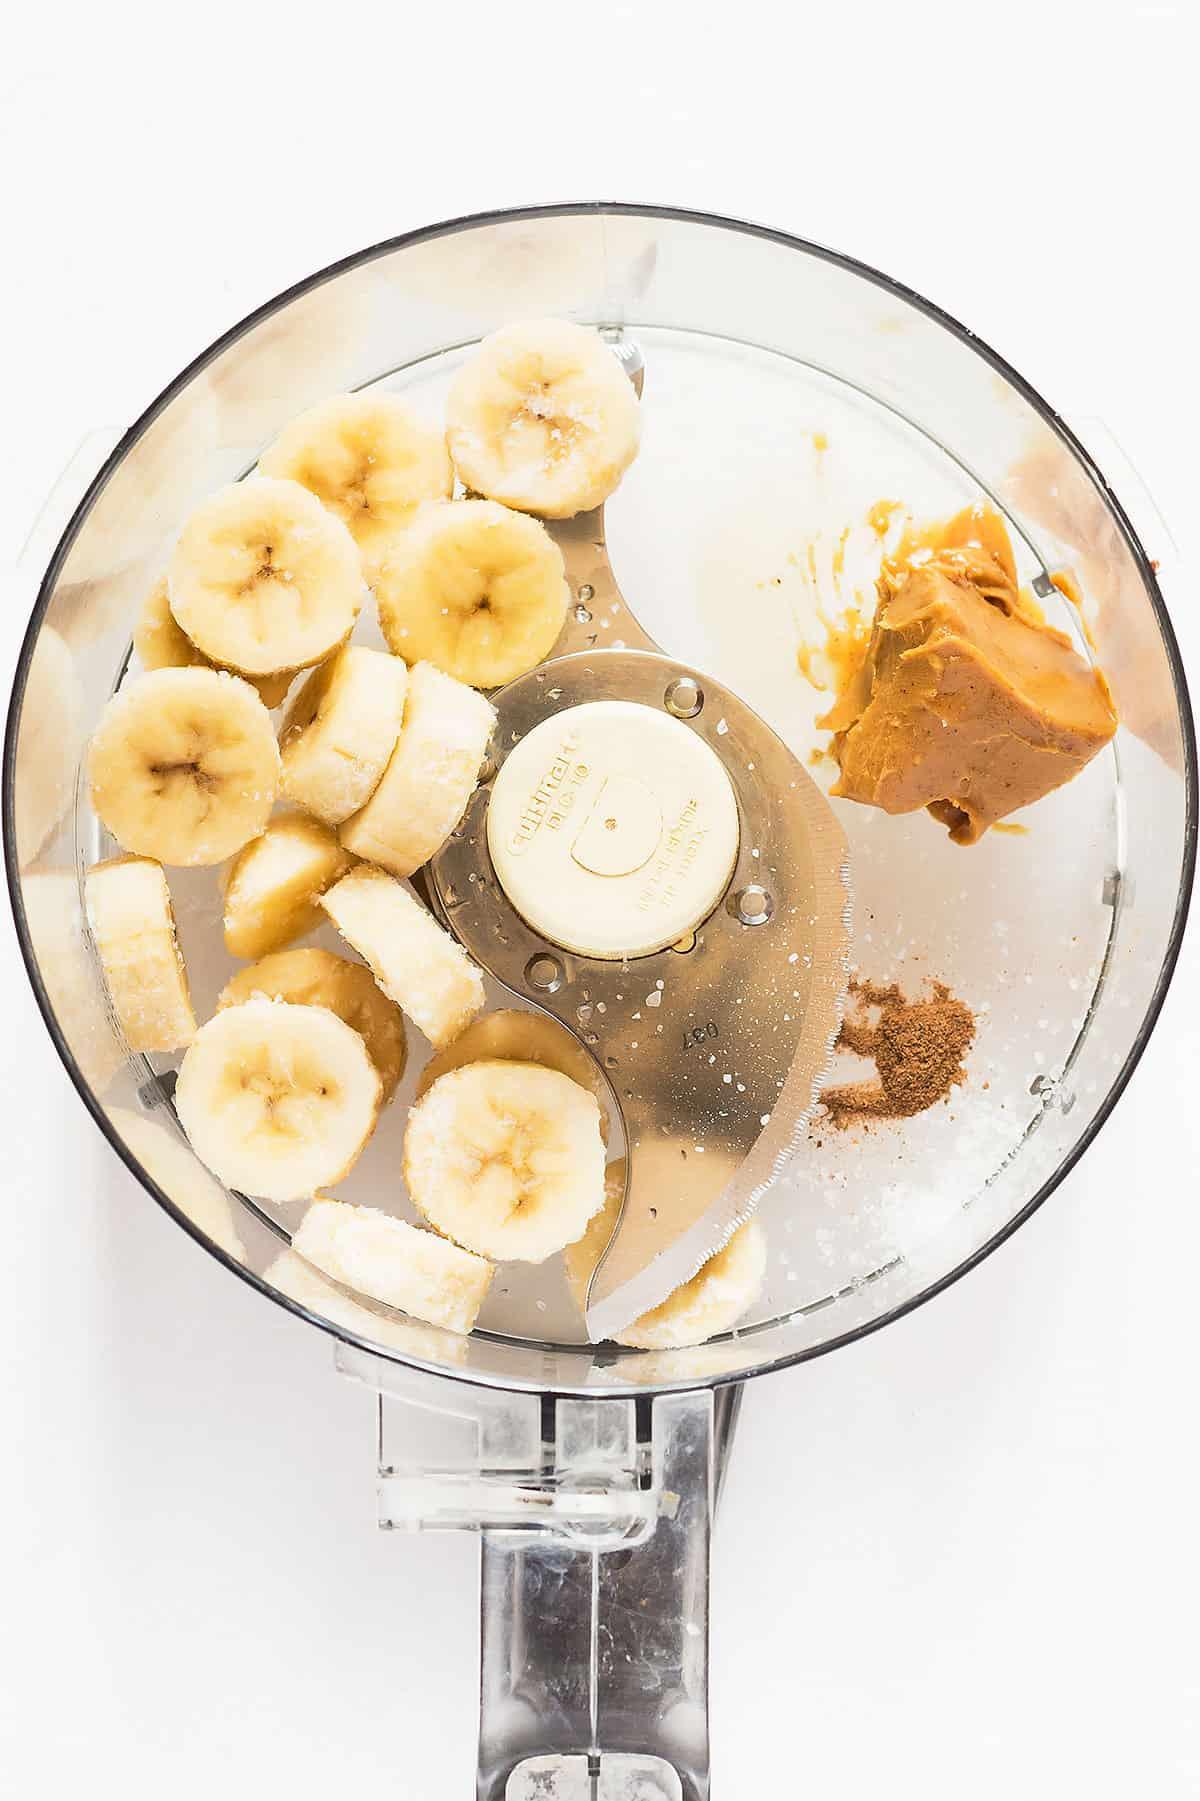 Bananas and PB in Food Processor